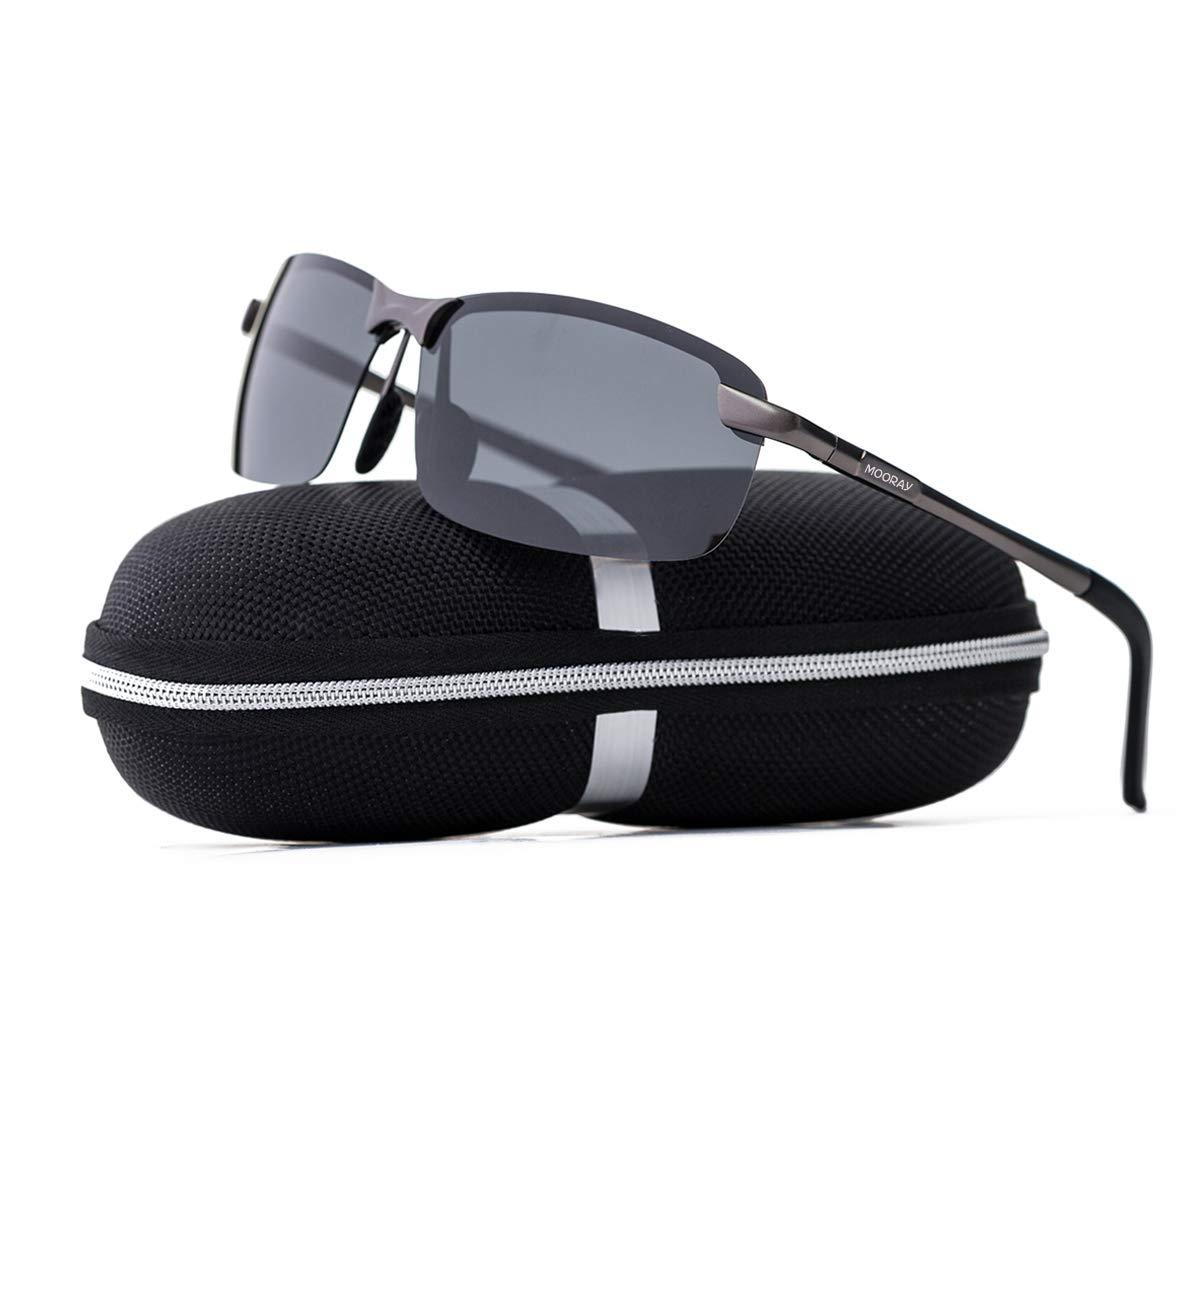 MOORAY Polarized Sunglasses for Men,UV400 Lens Sports Glasses,Outdoor Eyewear, Metal Frame Sunglasses(Grey)